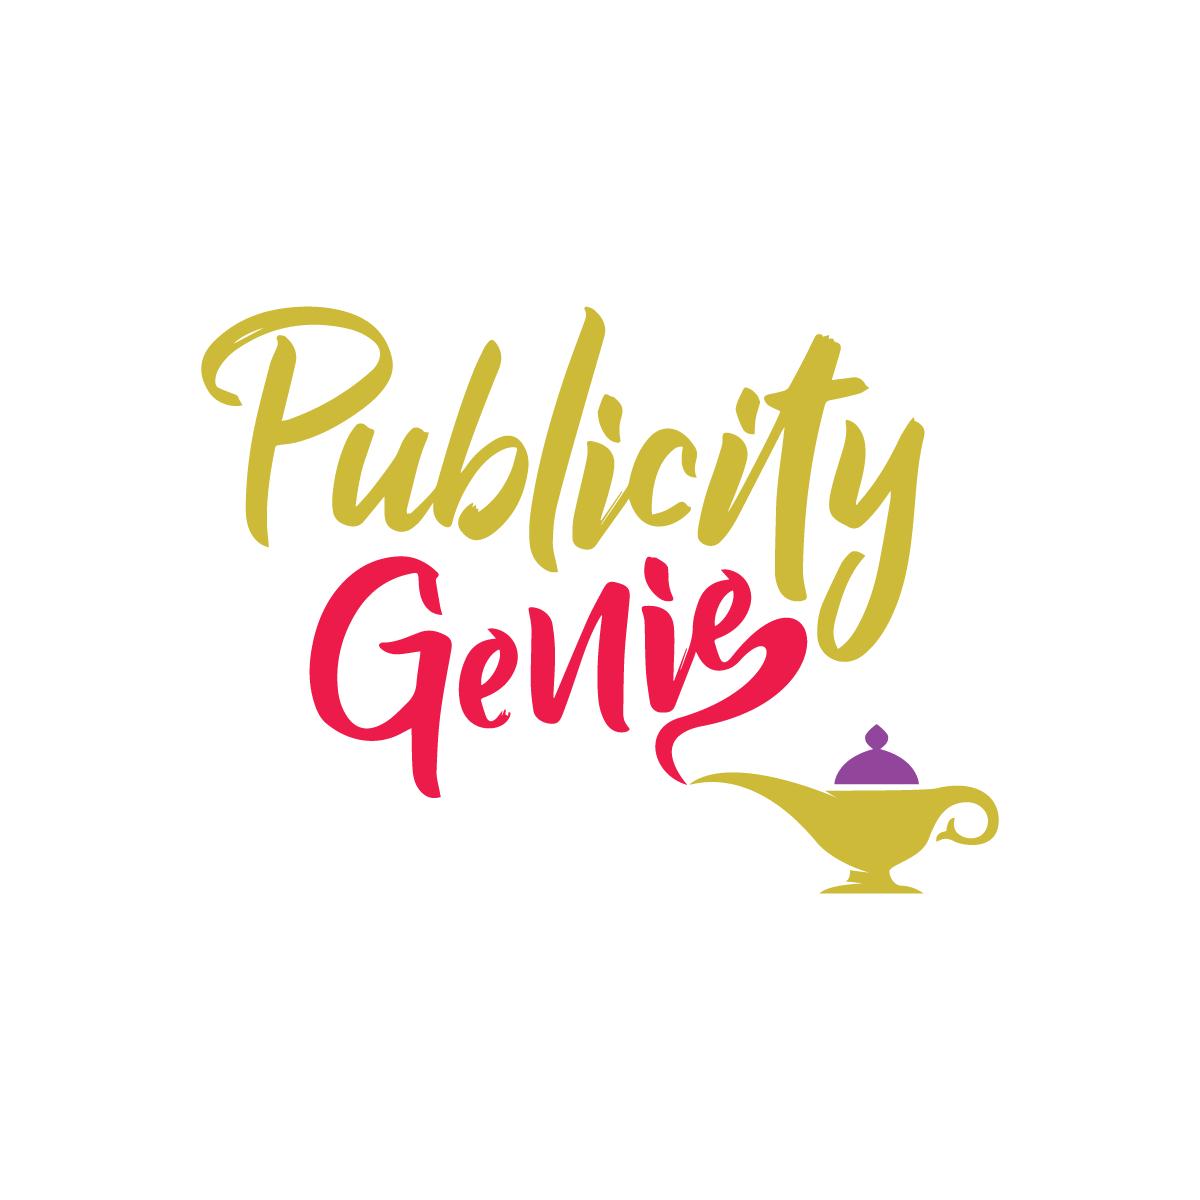 PublicityGenie Logo